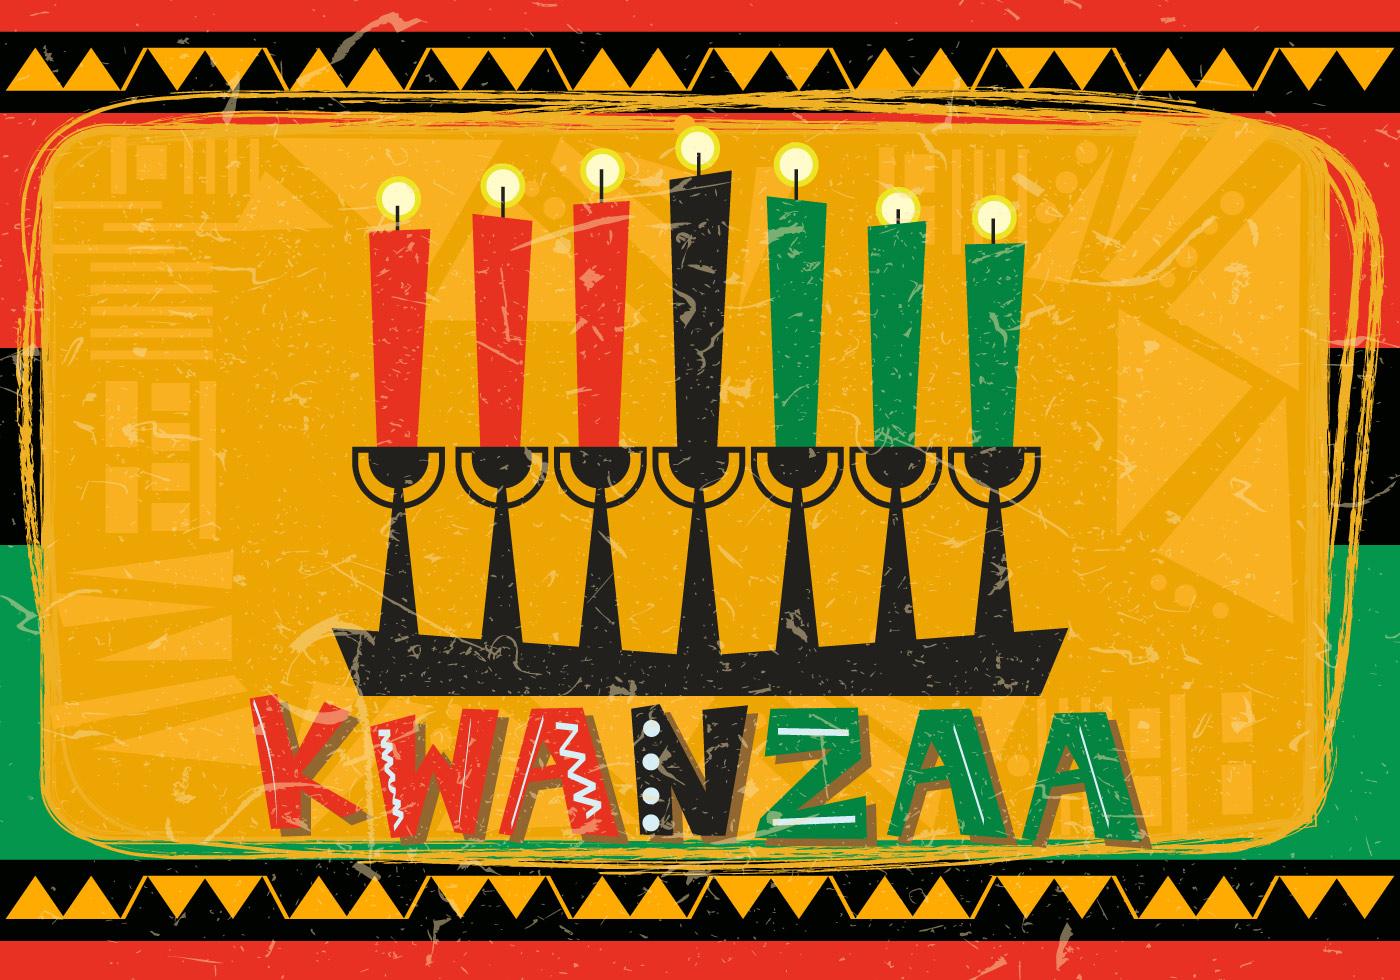 Happy Hanukkah 2018 >> Happy Kwanzaa With Kwanzaa Candle - Download Free Vector Art, Stock Graphics & Images